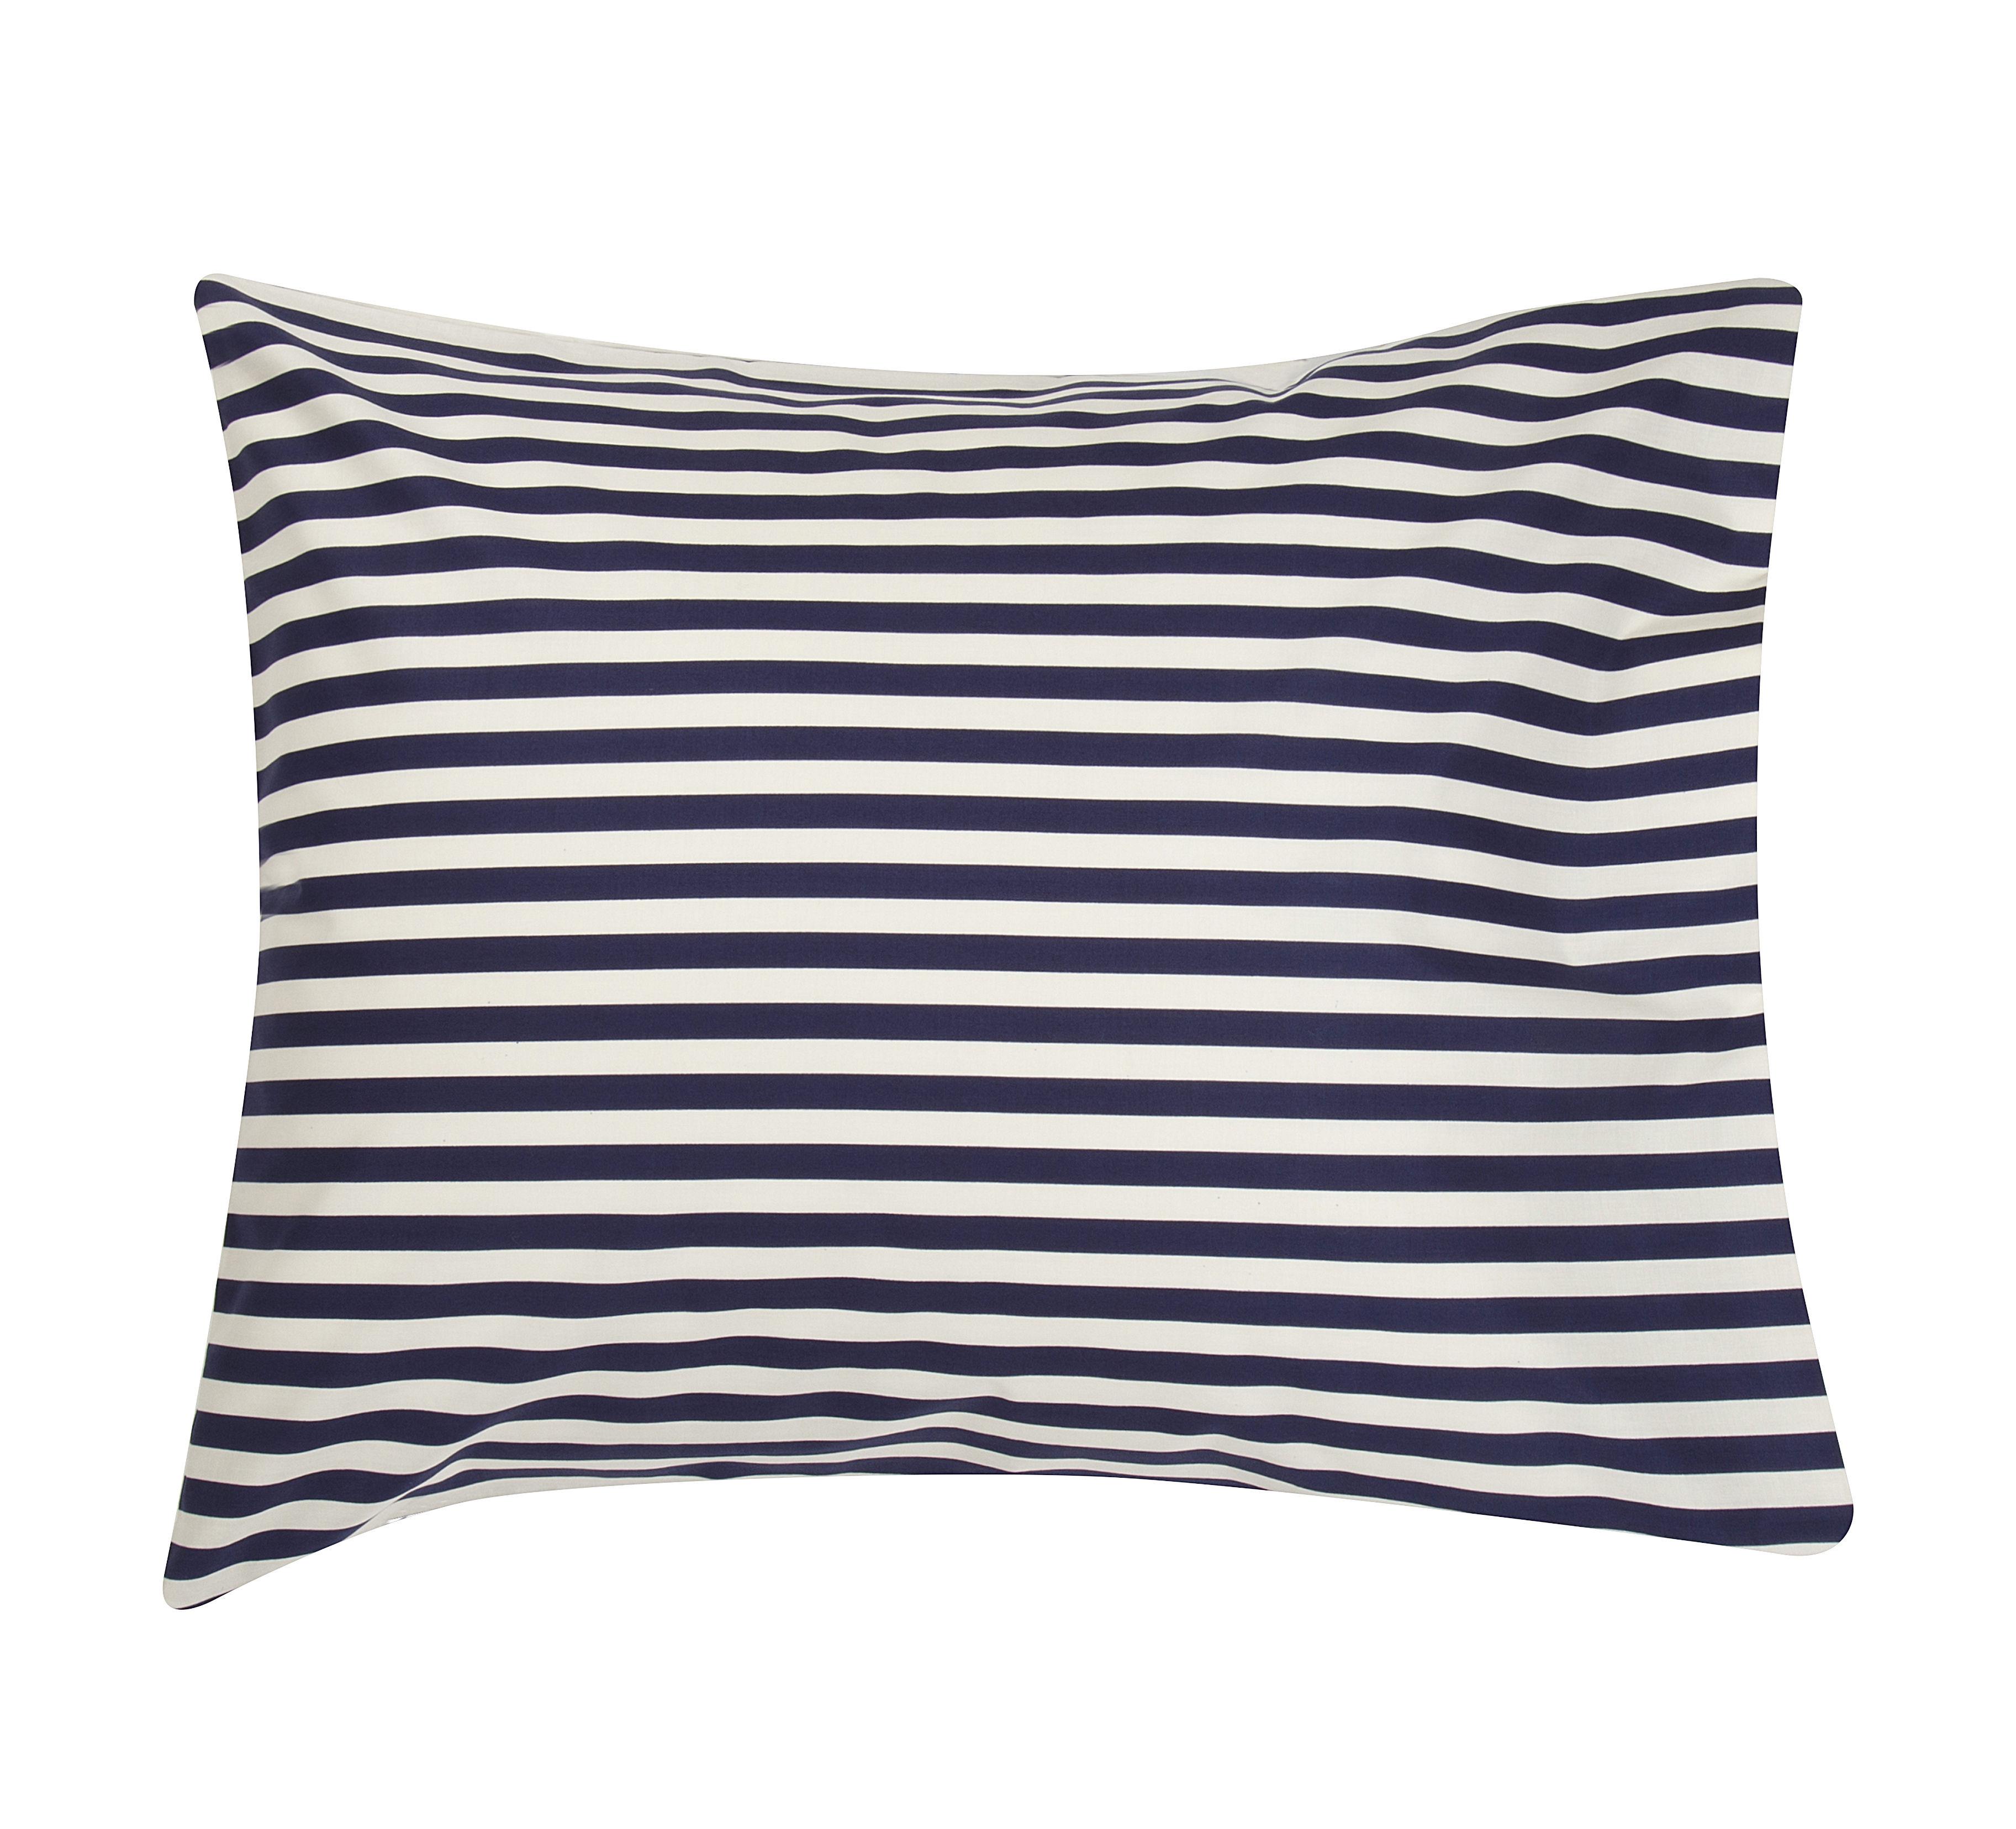 Déco - Coussins - Taie d'oreiller Oiva Tasaraita / 65 x 65 cm - Marimekko - Tasaraita / Blanc & bleu marine - Coton